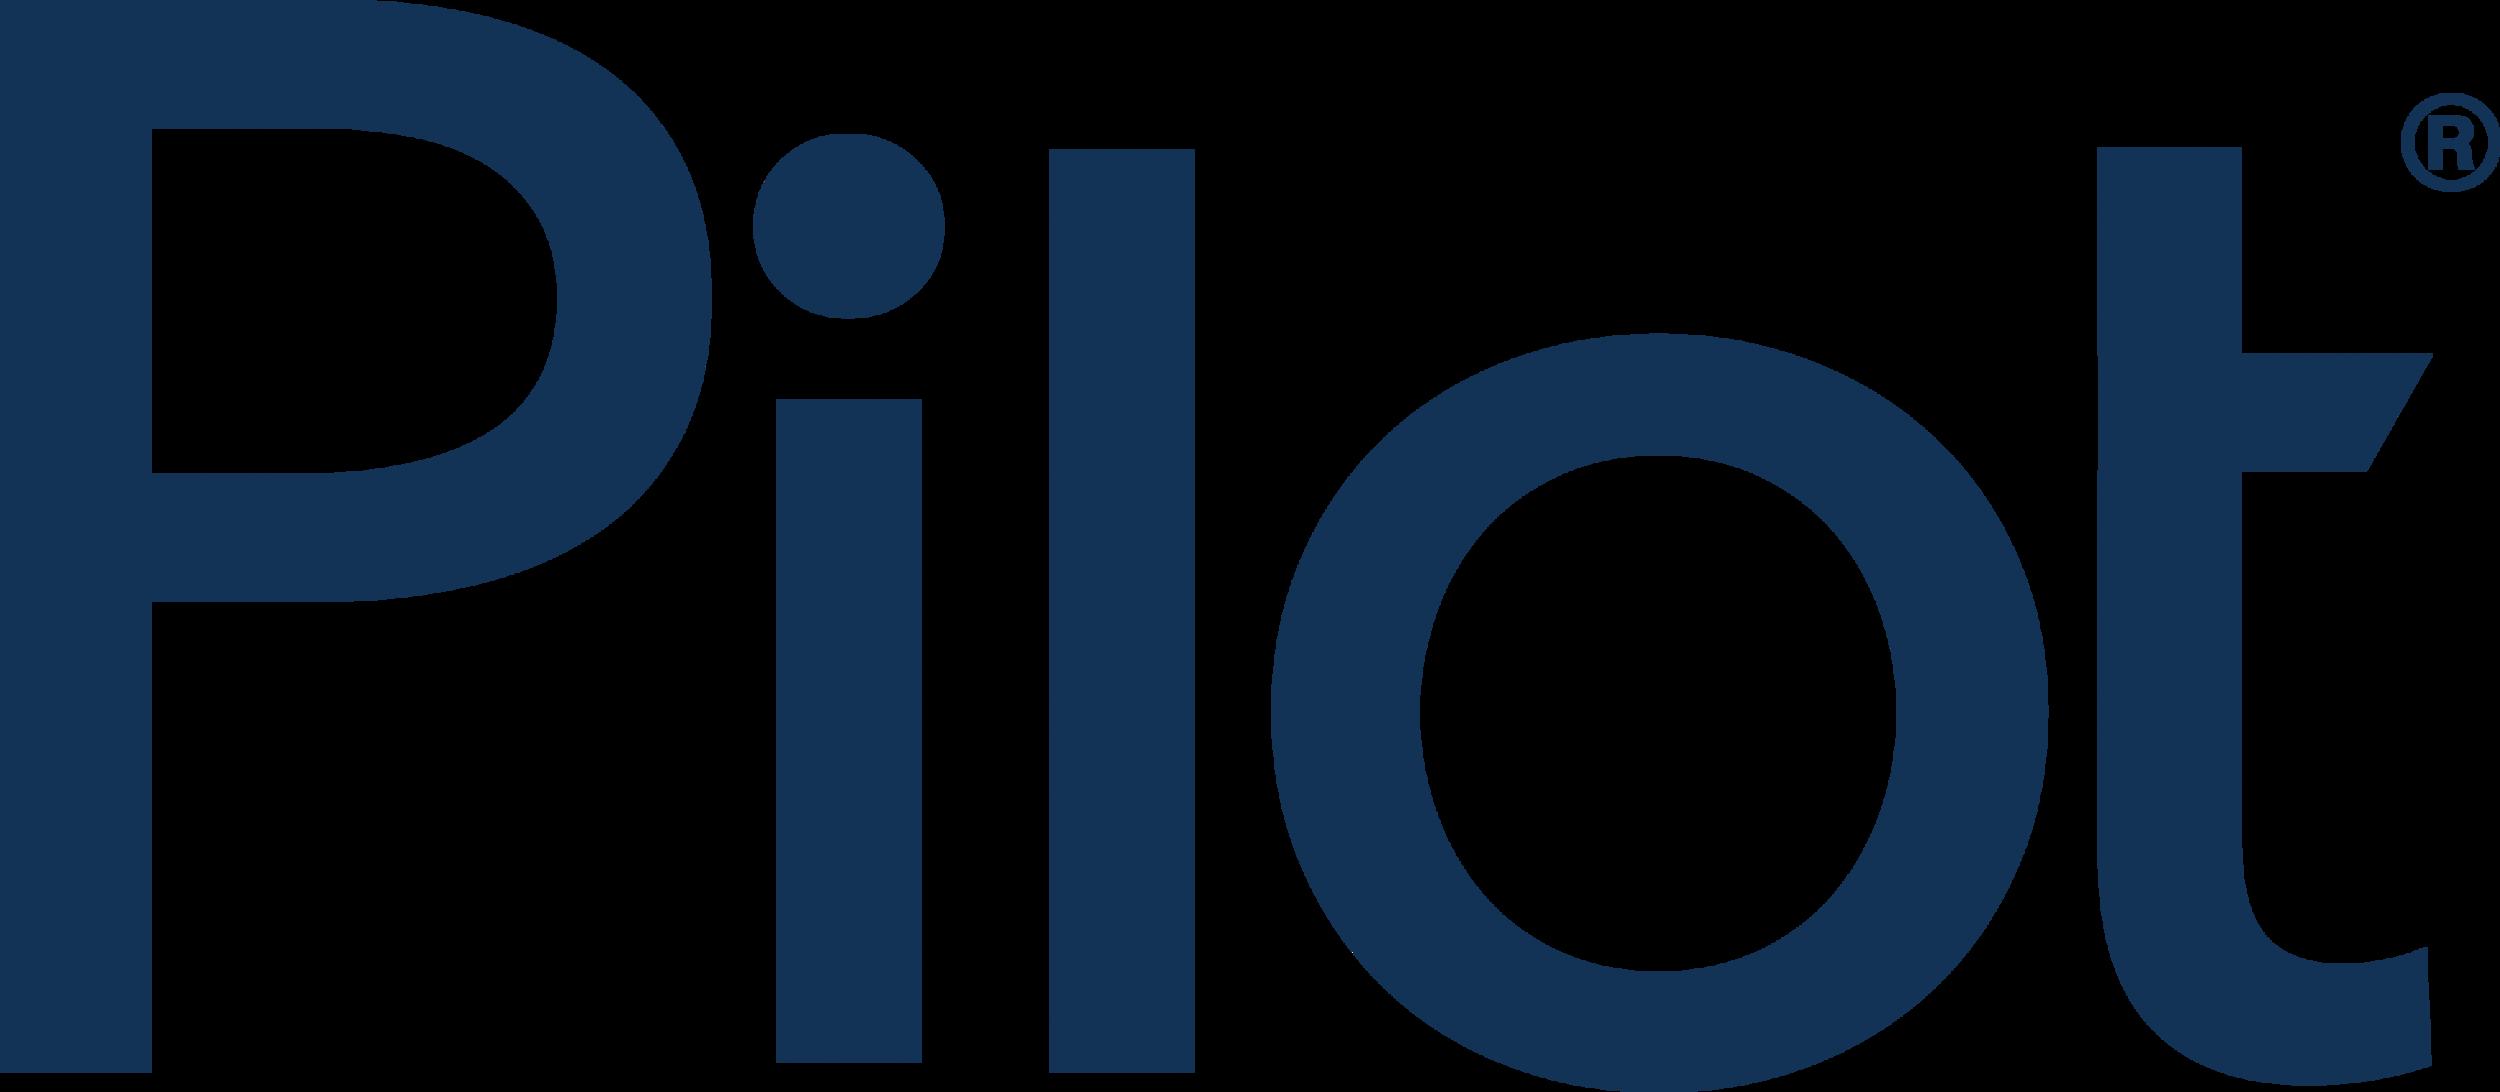 ShowSeeker_Pilot_Logo.png